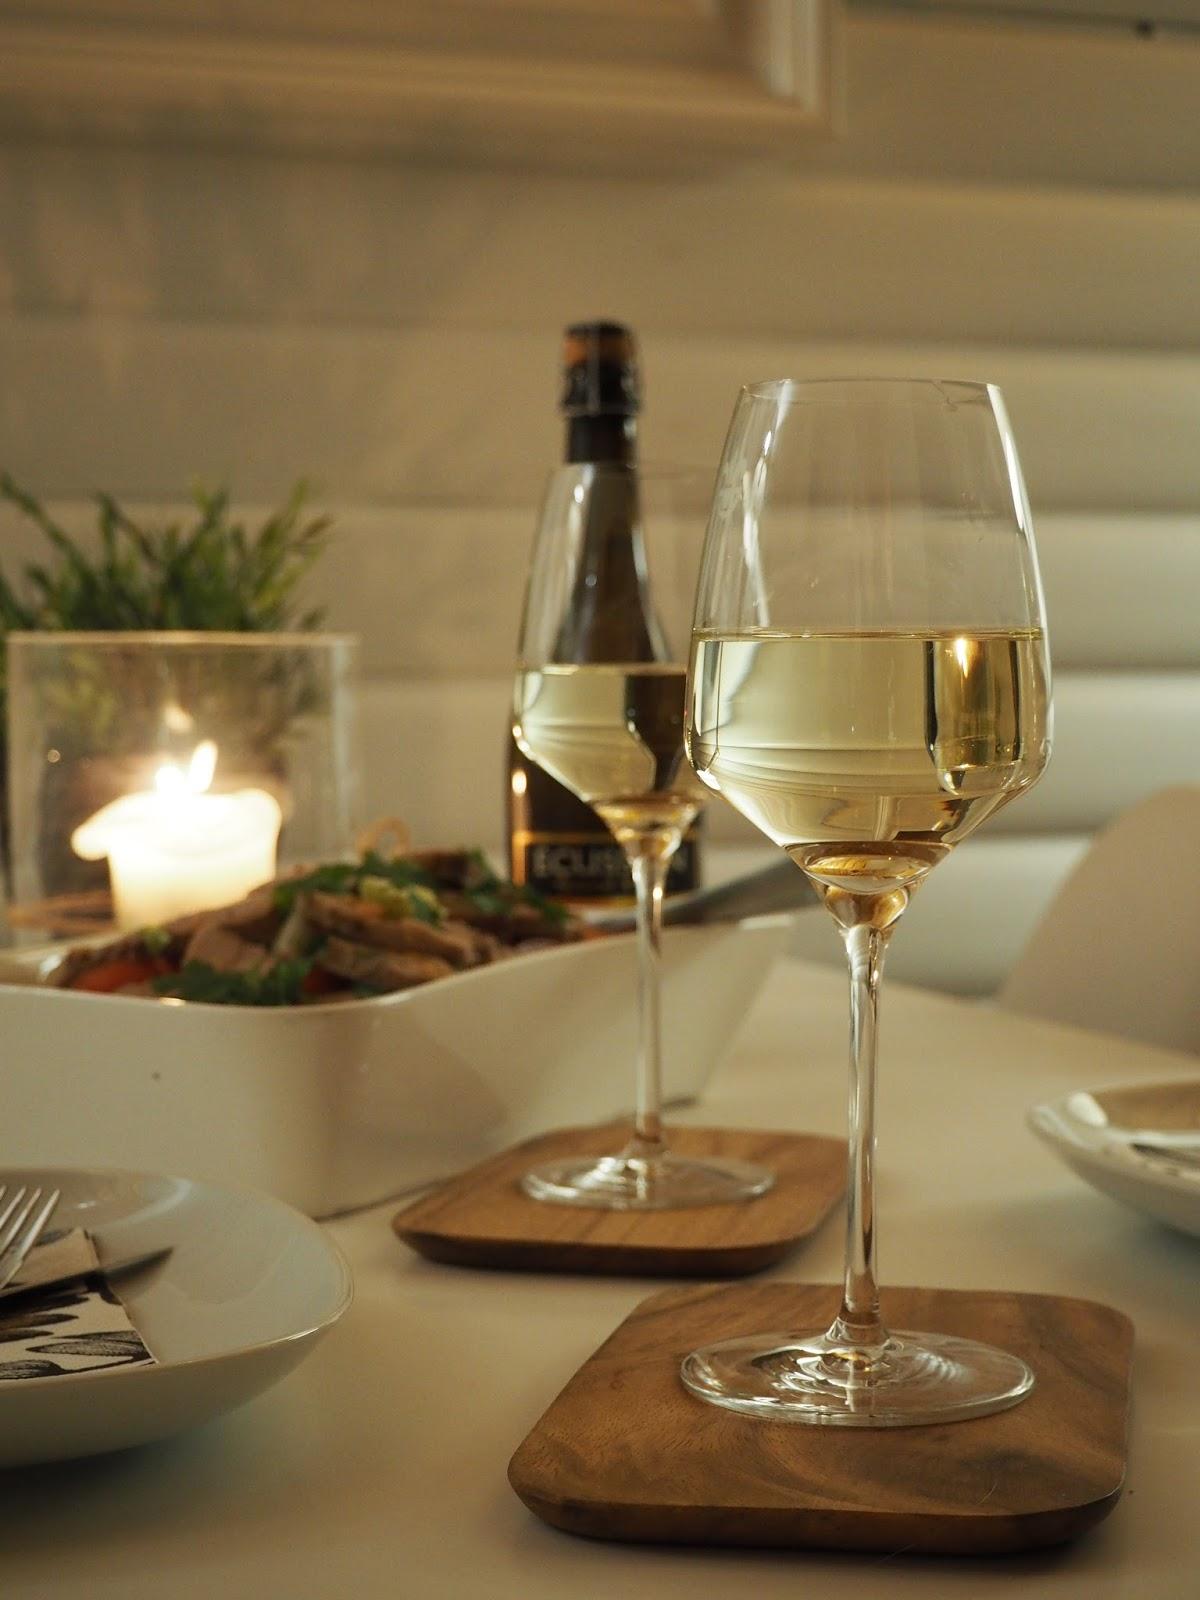 Muurla viinilasi